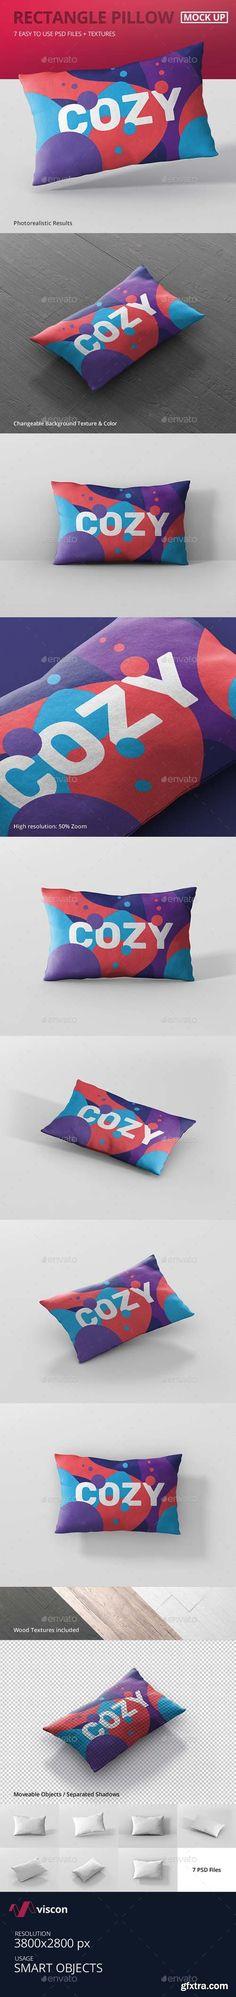 GR - Pillow Mockup - Rectangle 20133703